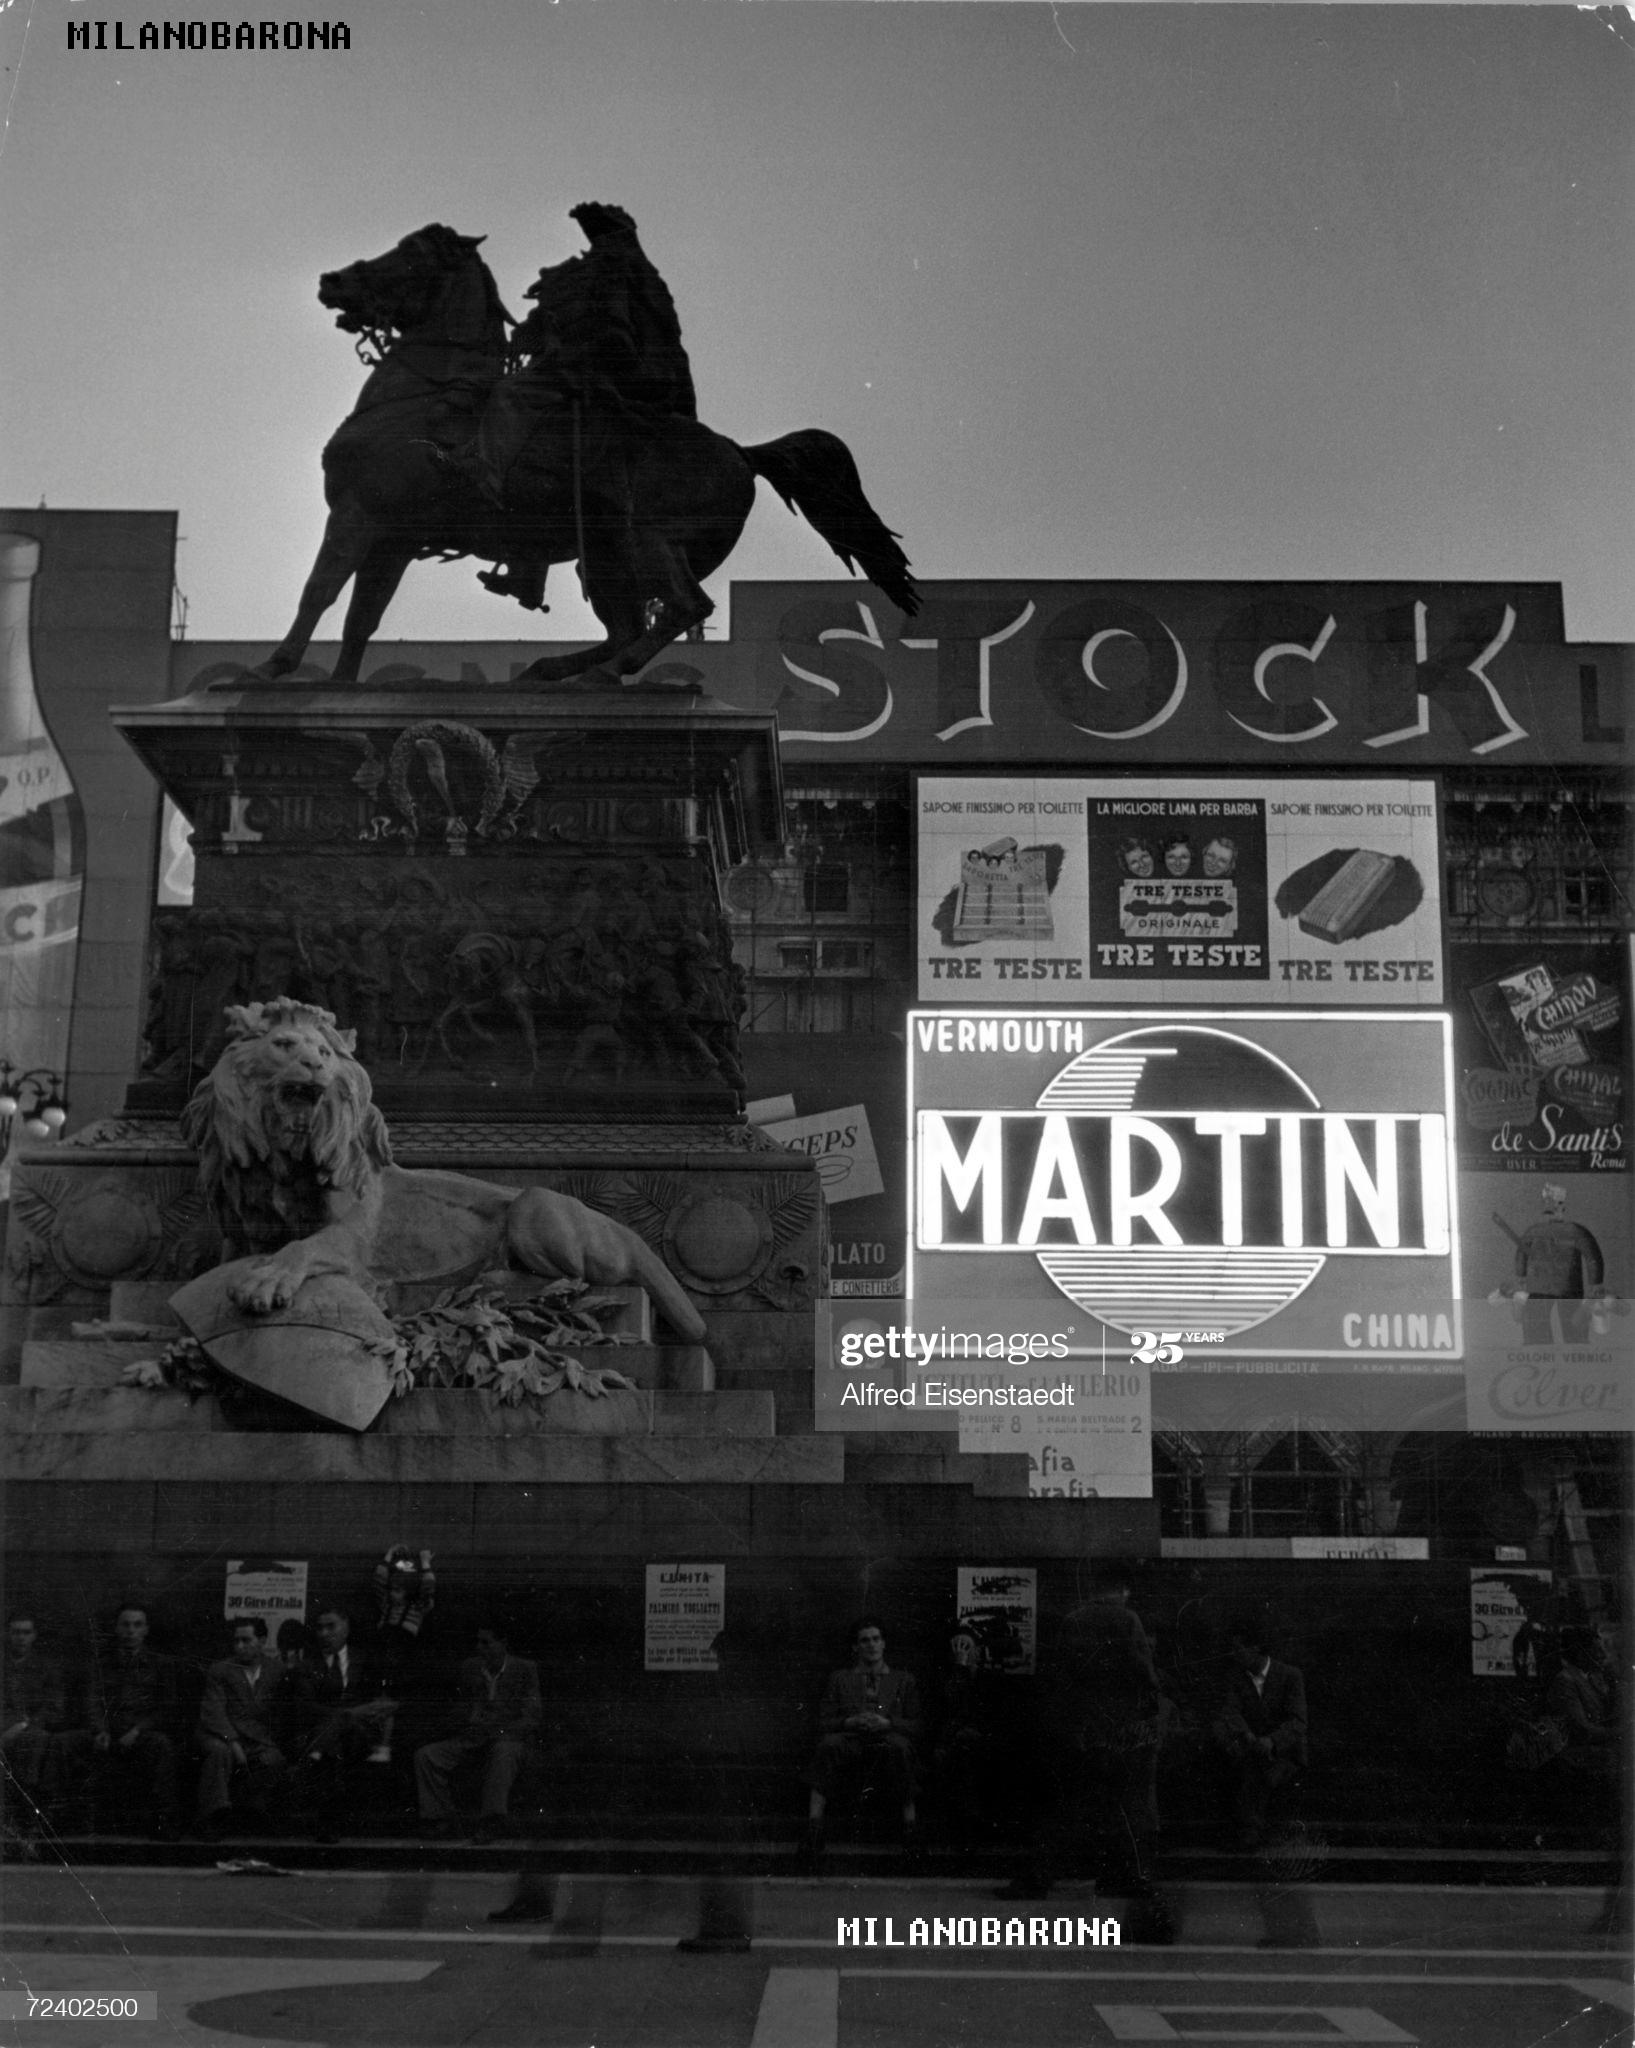 Piazza Duomo primi anni '50 del 1900. Autore foto Alfred Eisenstaedt, fonte Gettyimages Japan